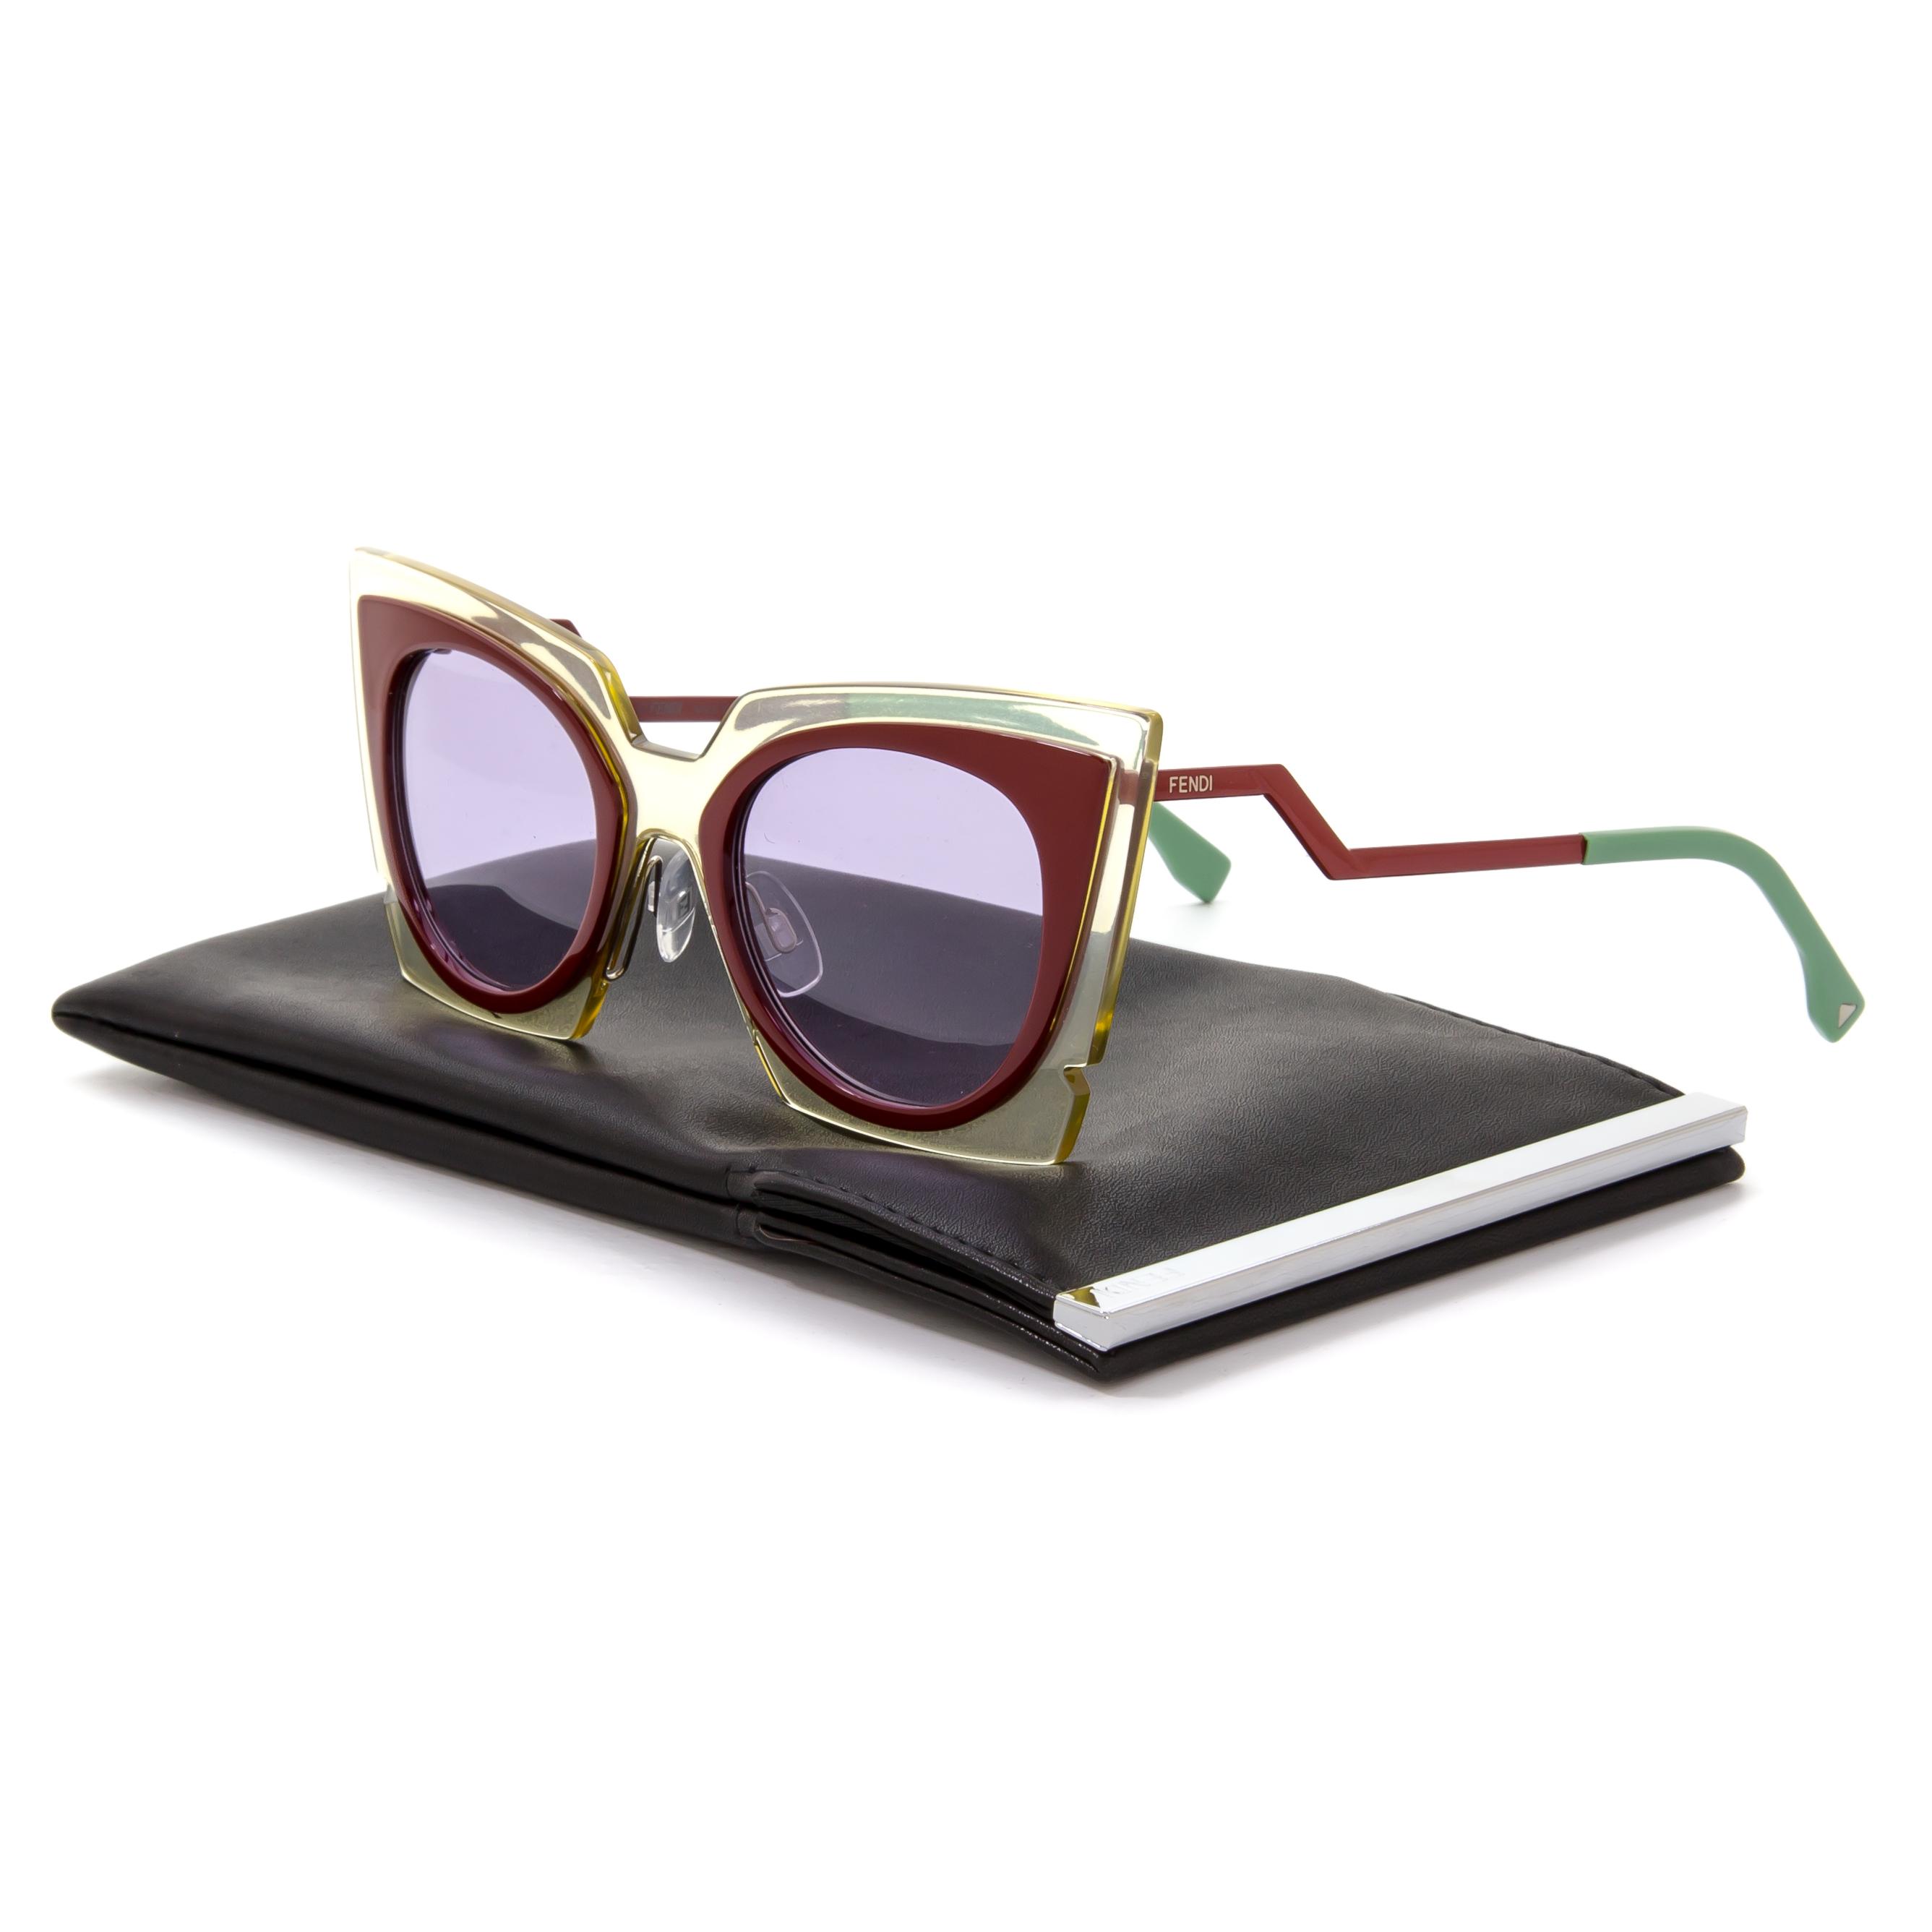 7565ca79a5c0 Fendi 0117 S Orchid Fashion Show Cat Eye Sunglasses IC5Y4 Burgundy Red    Purple